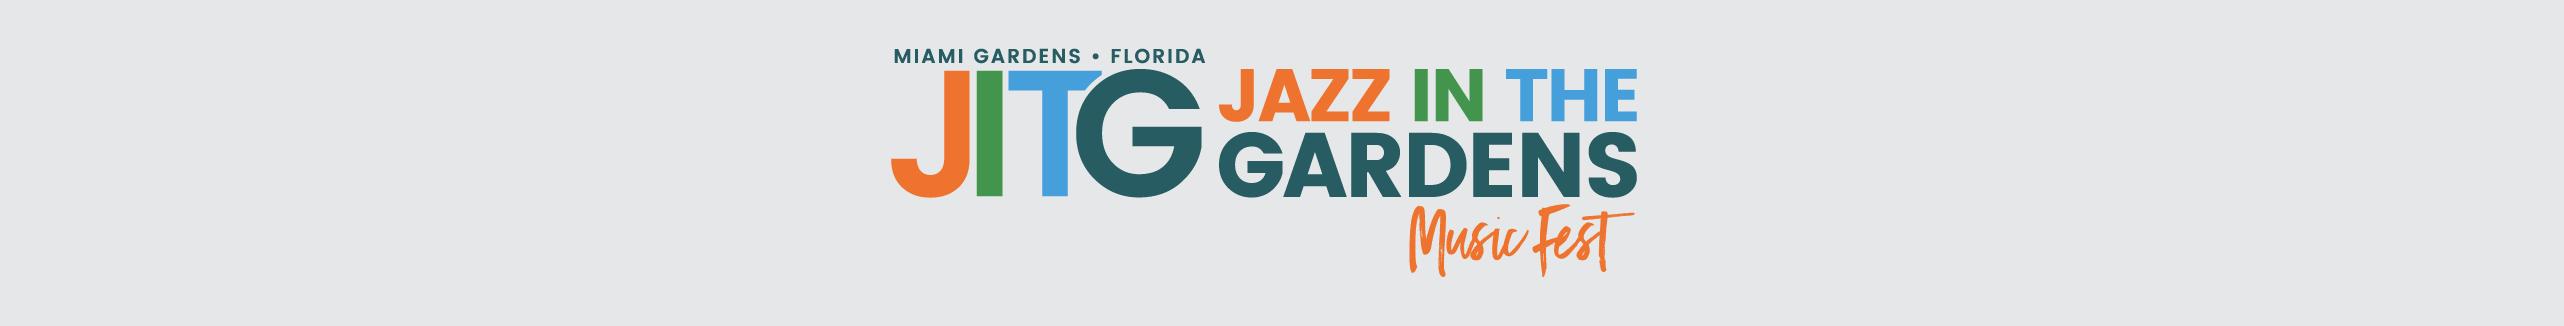 Jazz In The Gardens Music Fest 2020